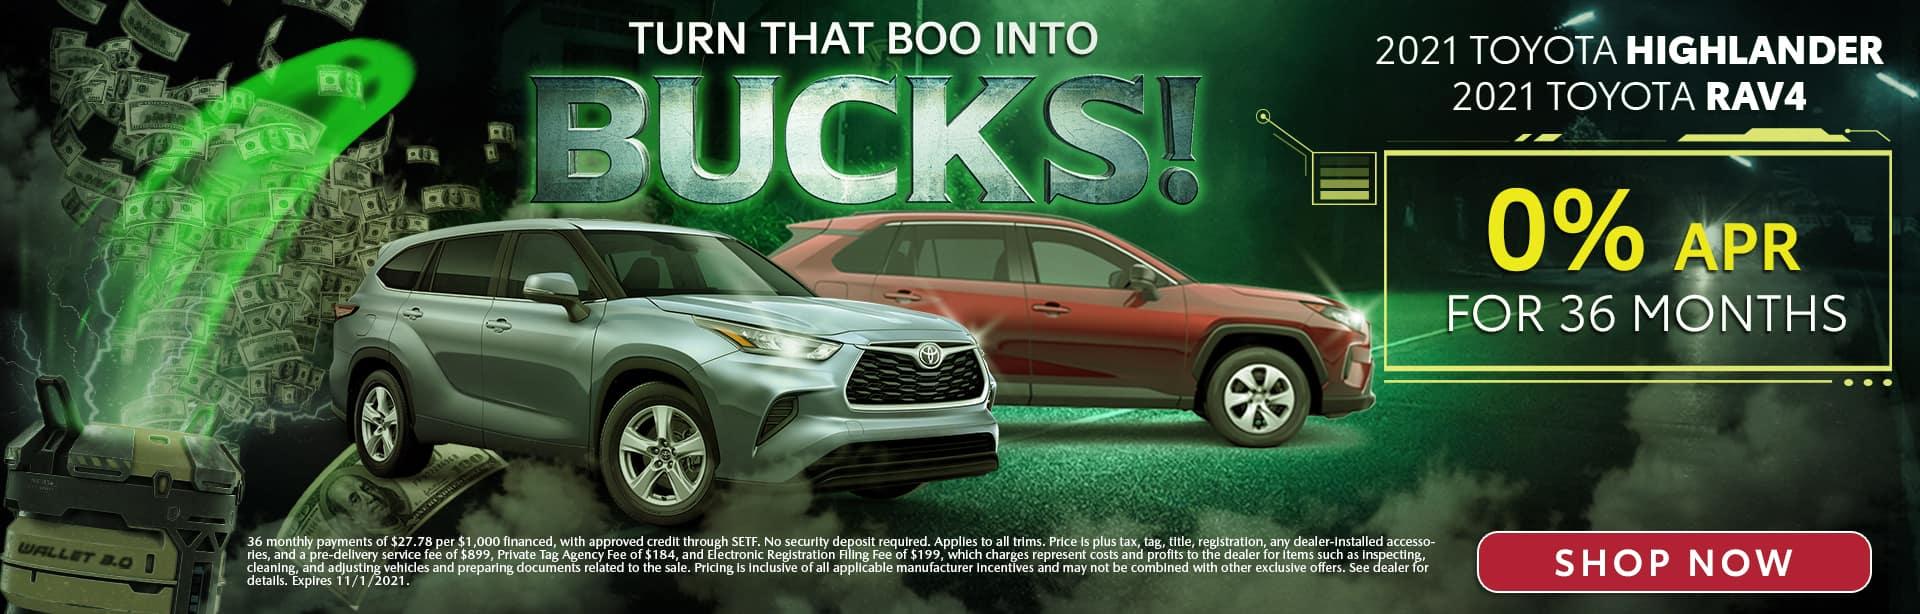 Turn That Boo Into Bucks | 2021 Toyota Highlander & 2021 Toyota RAV4 | 0% APR For 36 Months